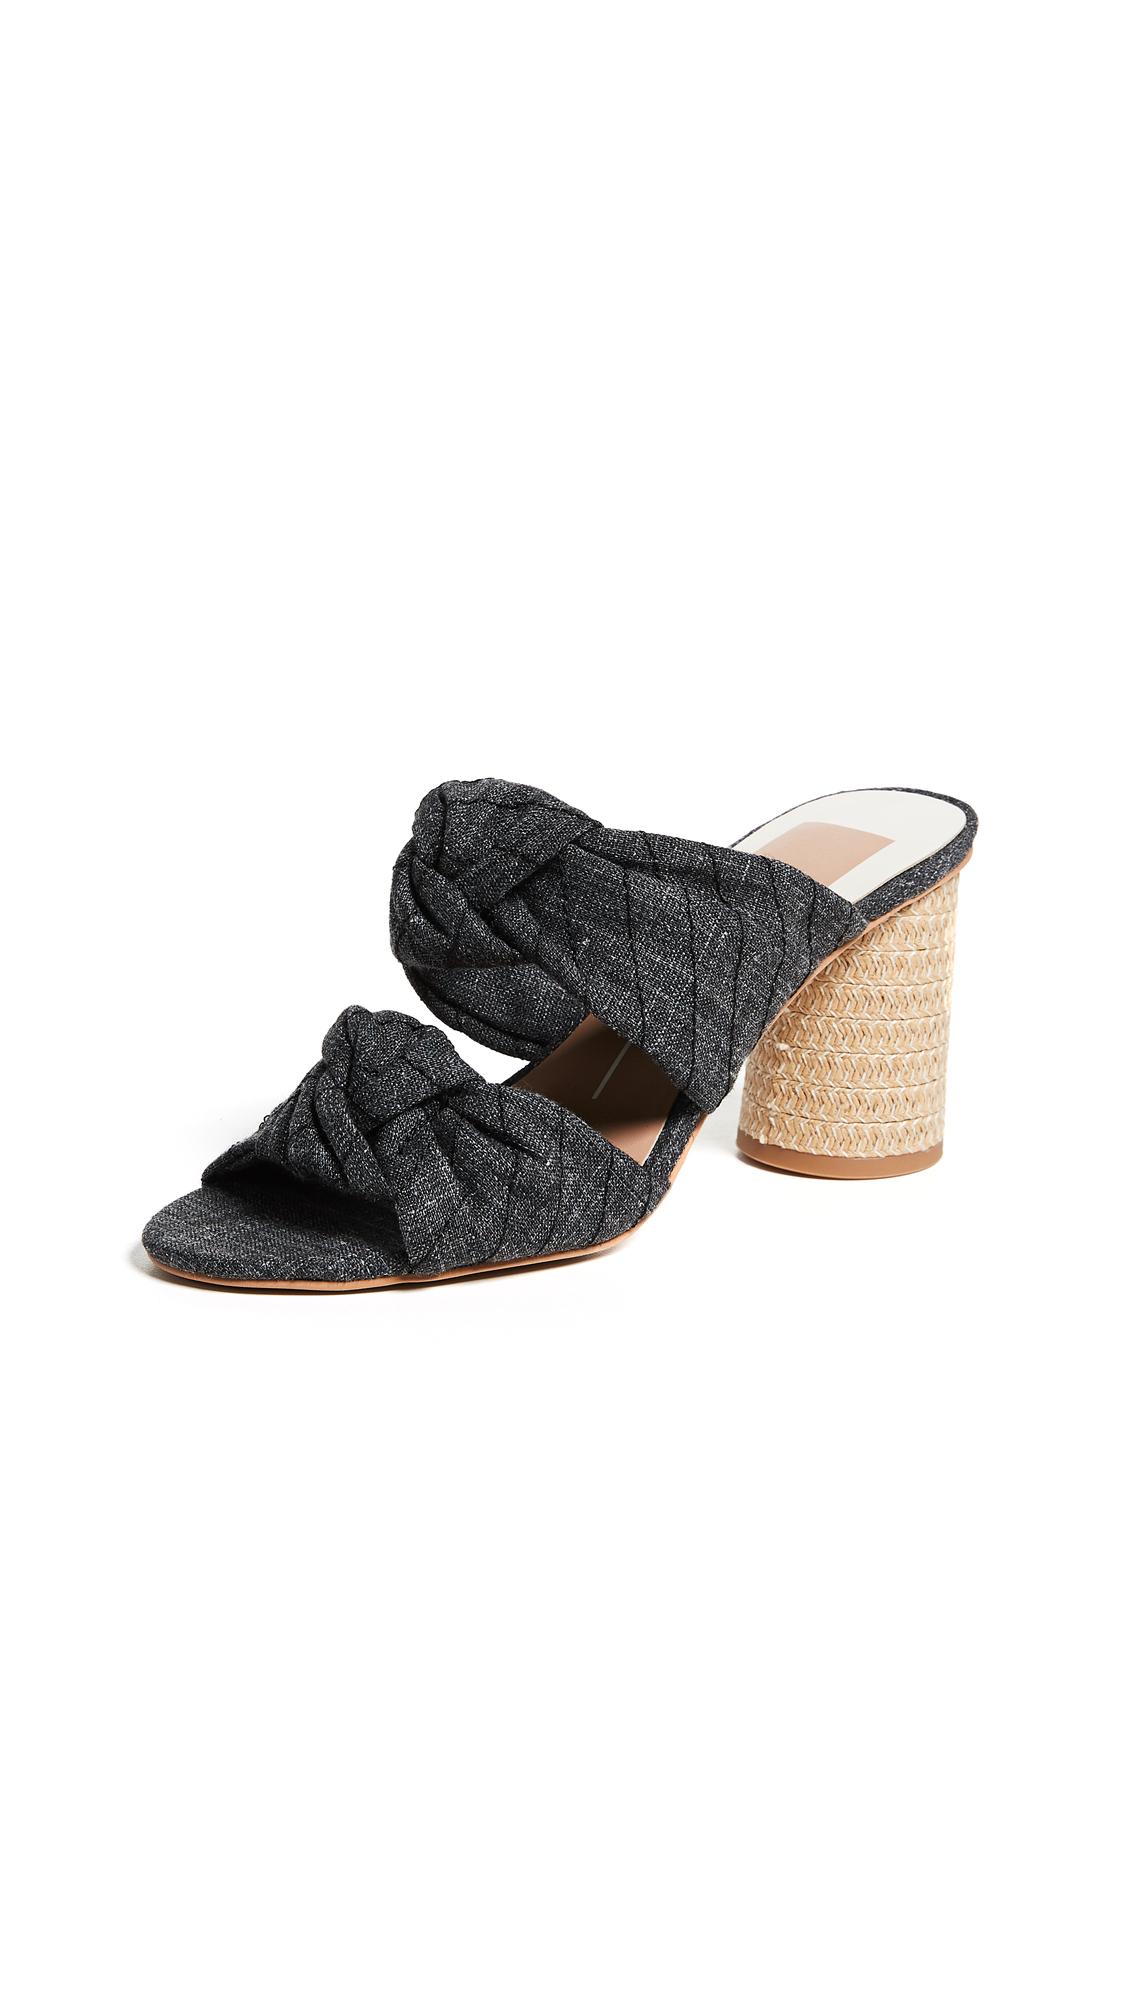 Dolce Vita Jene Double Strap Sandals - Ash